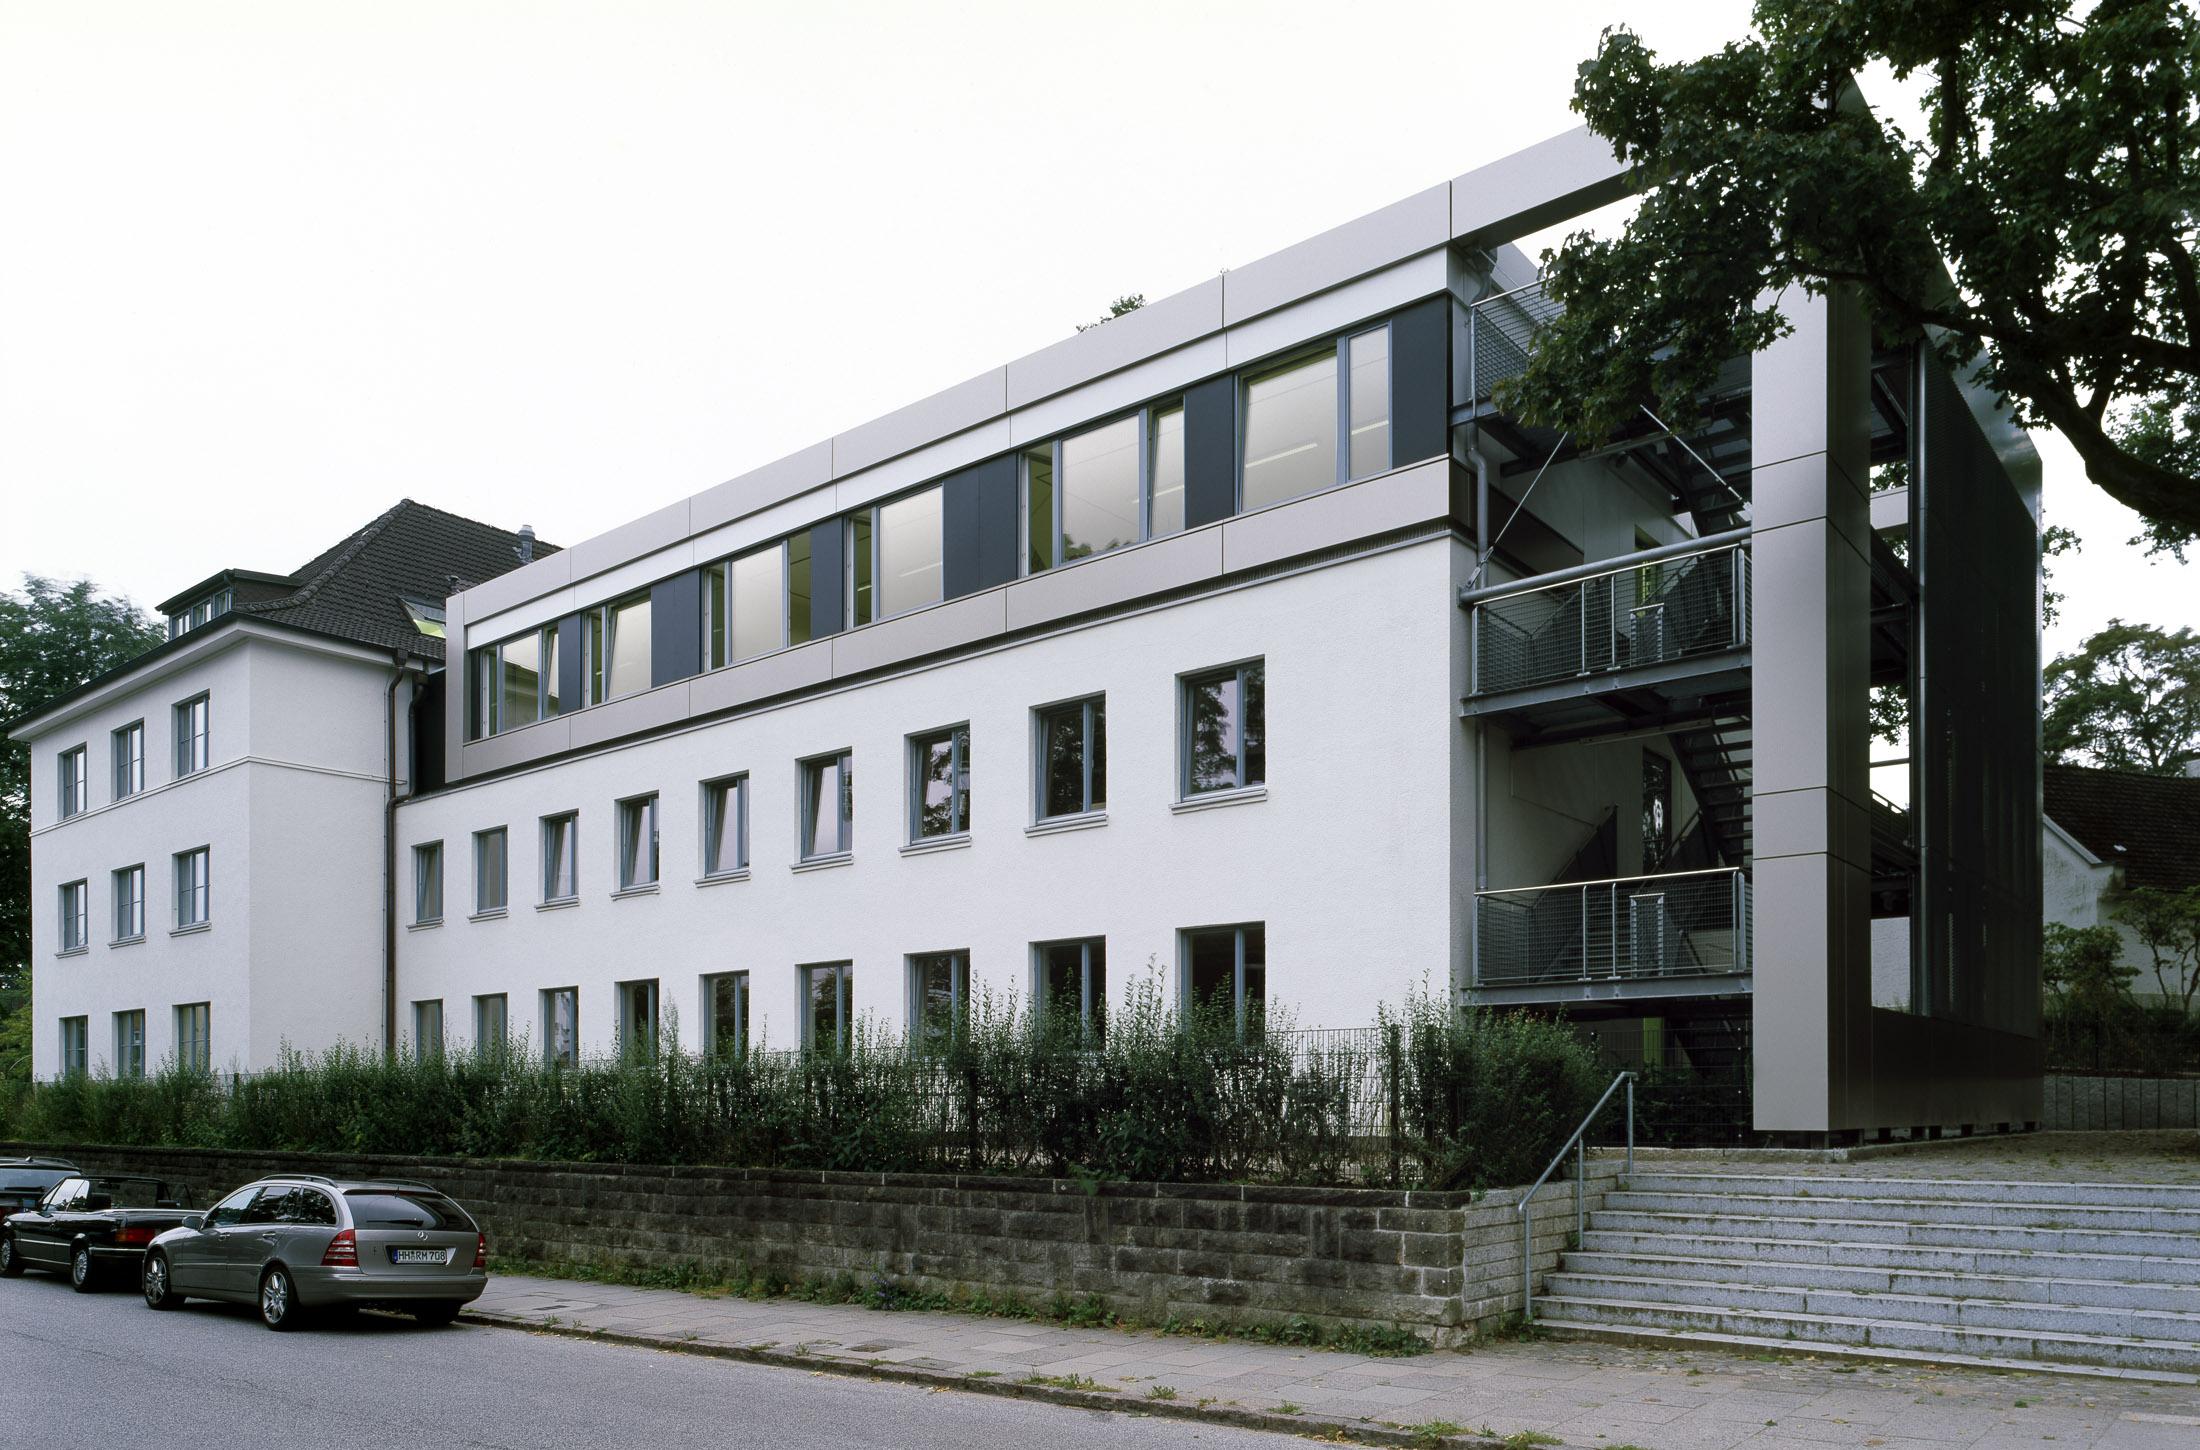 Bugenhagenschule Hamburg